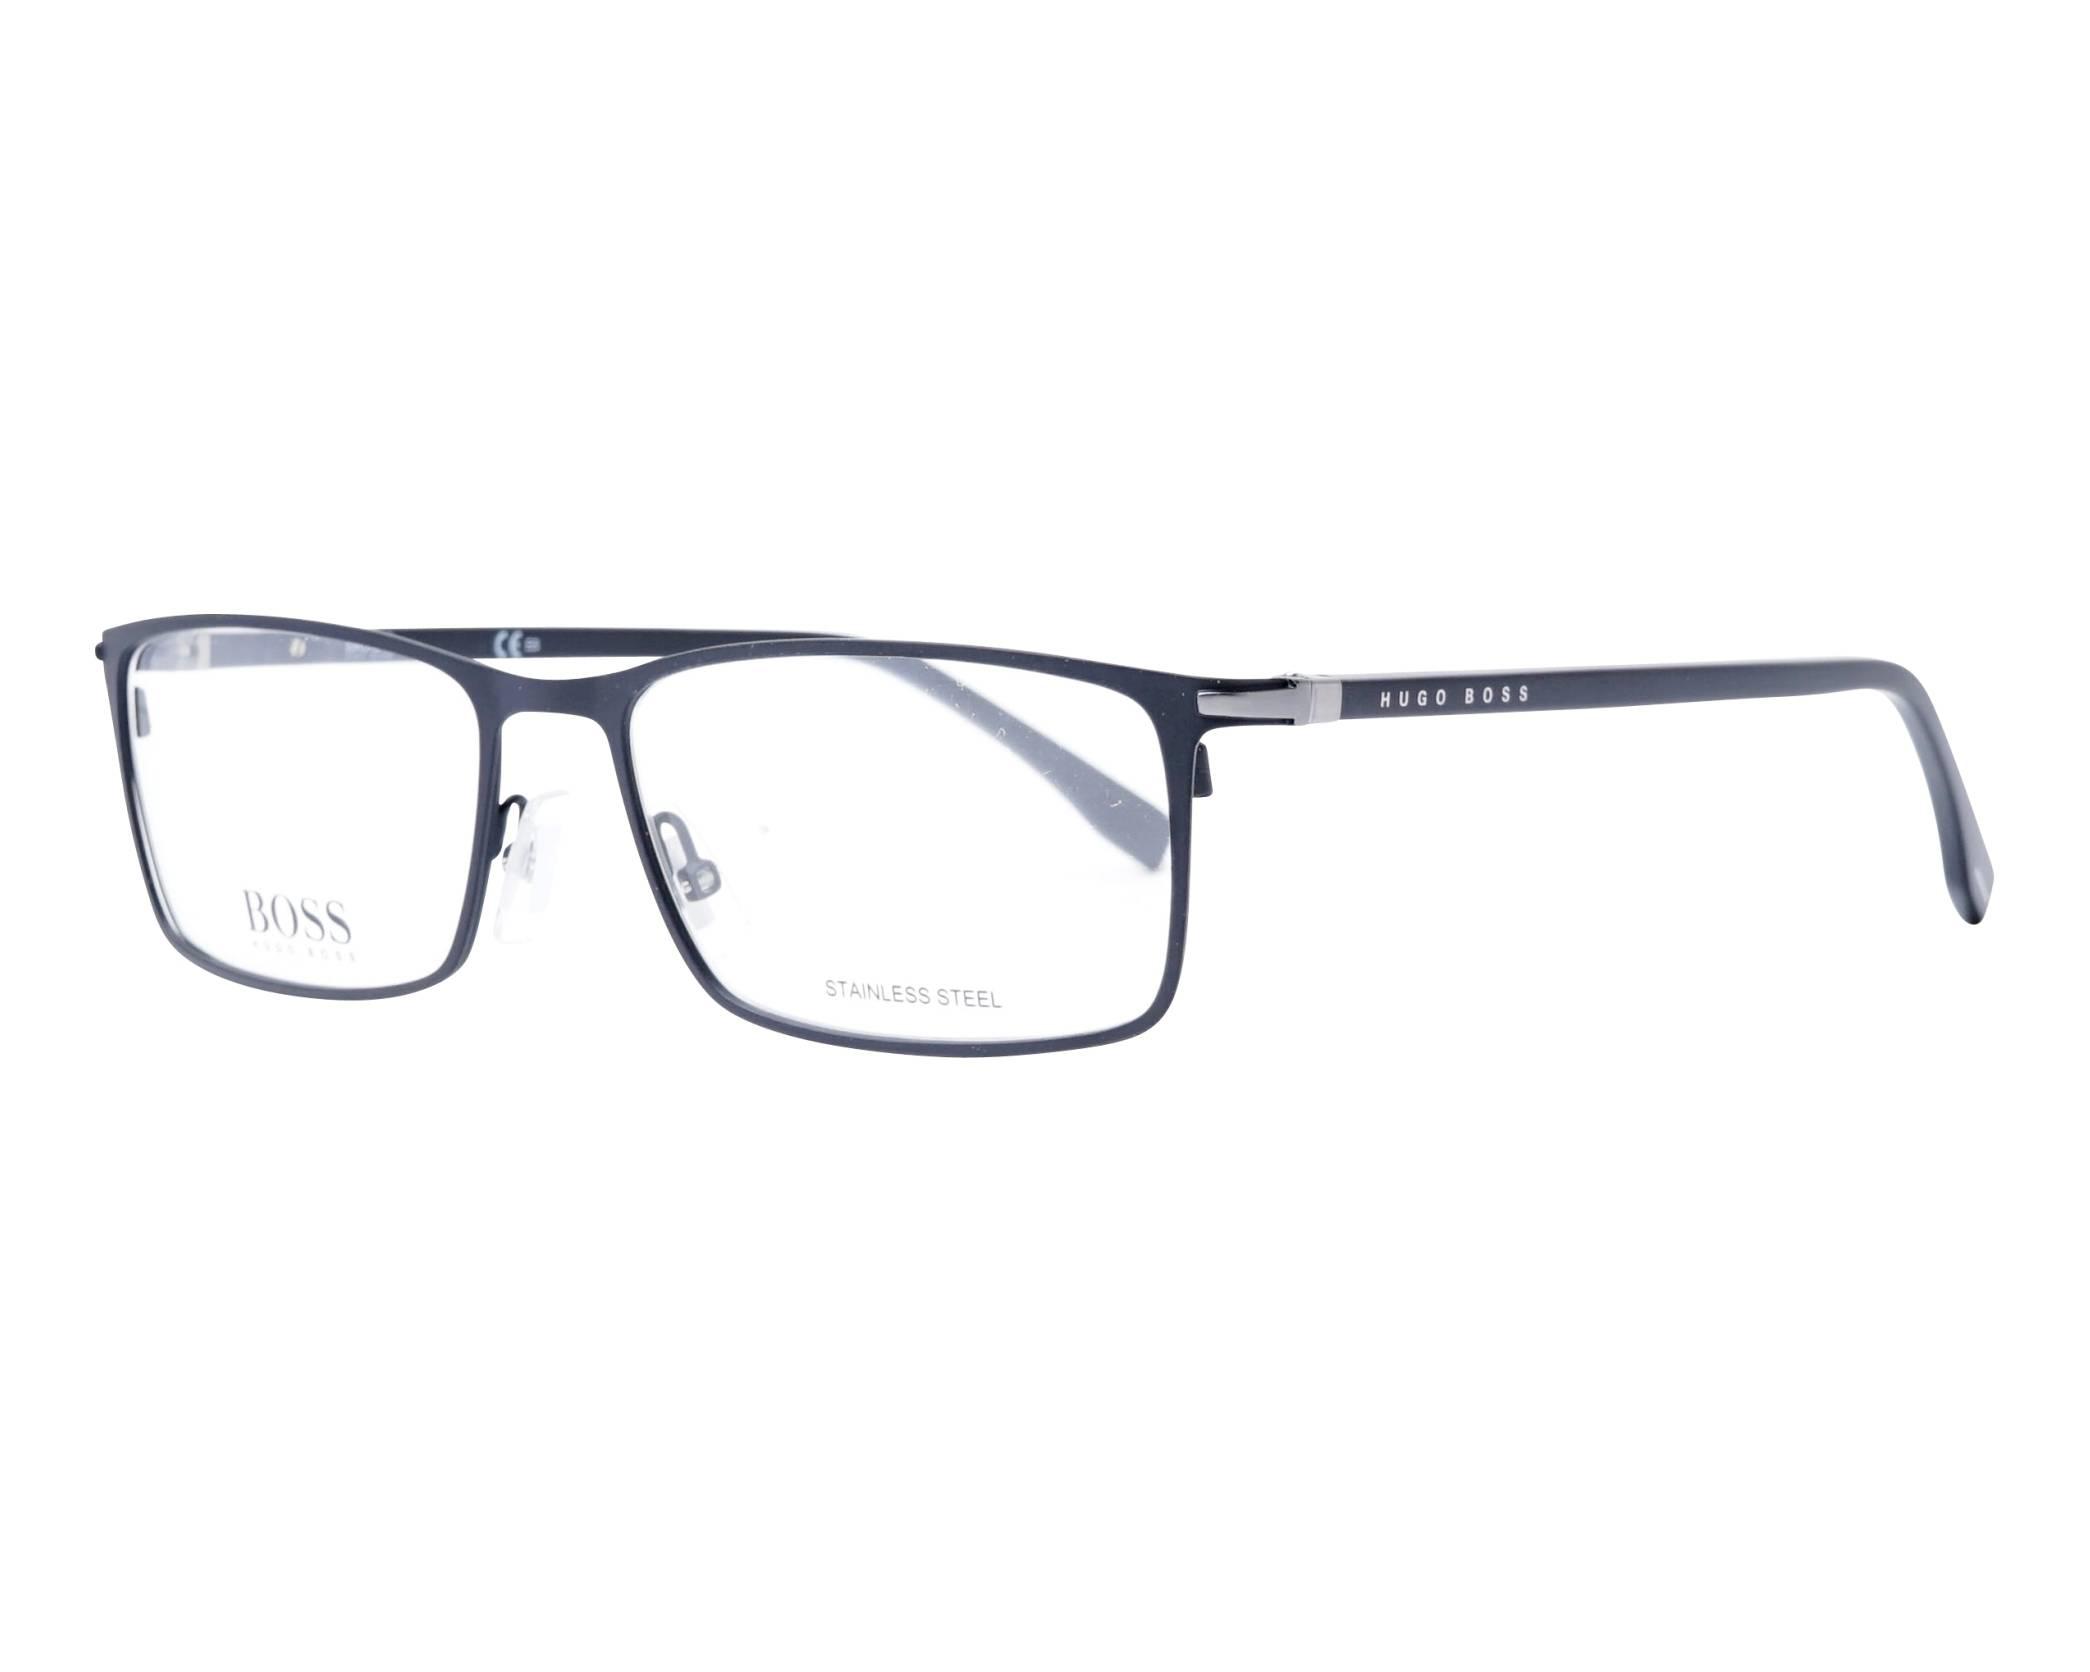 40e627439b32 eyeglasses Hugo Boss BOSS-1006 003 57-17 Black profile view